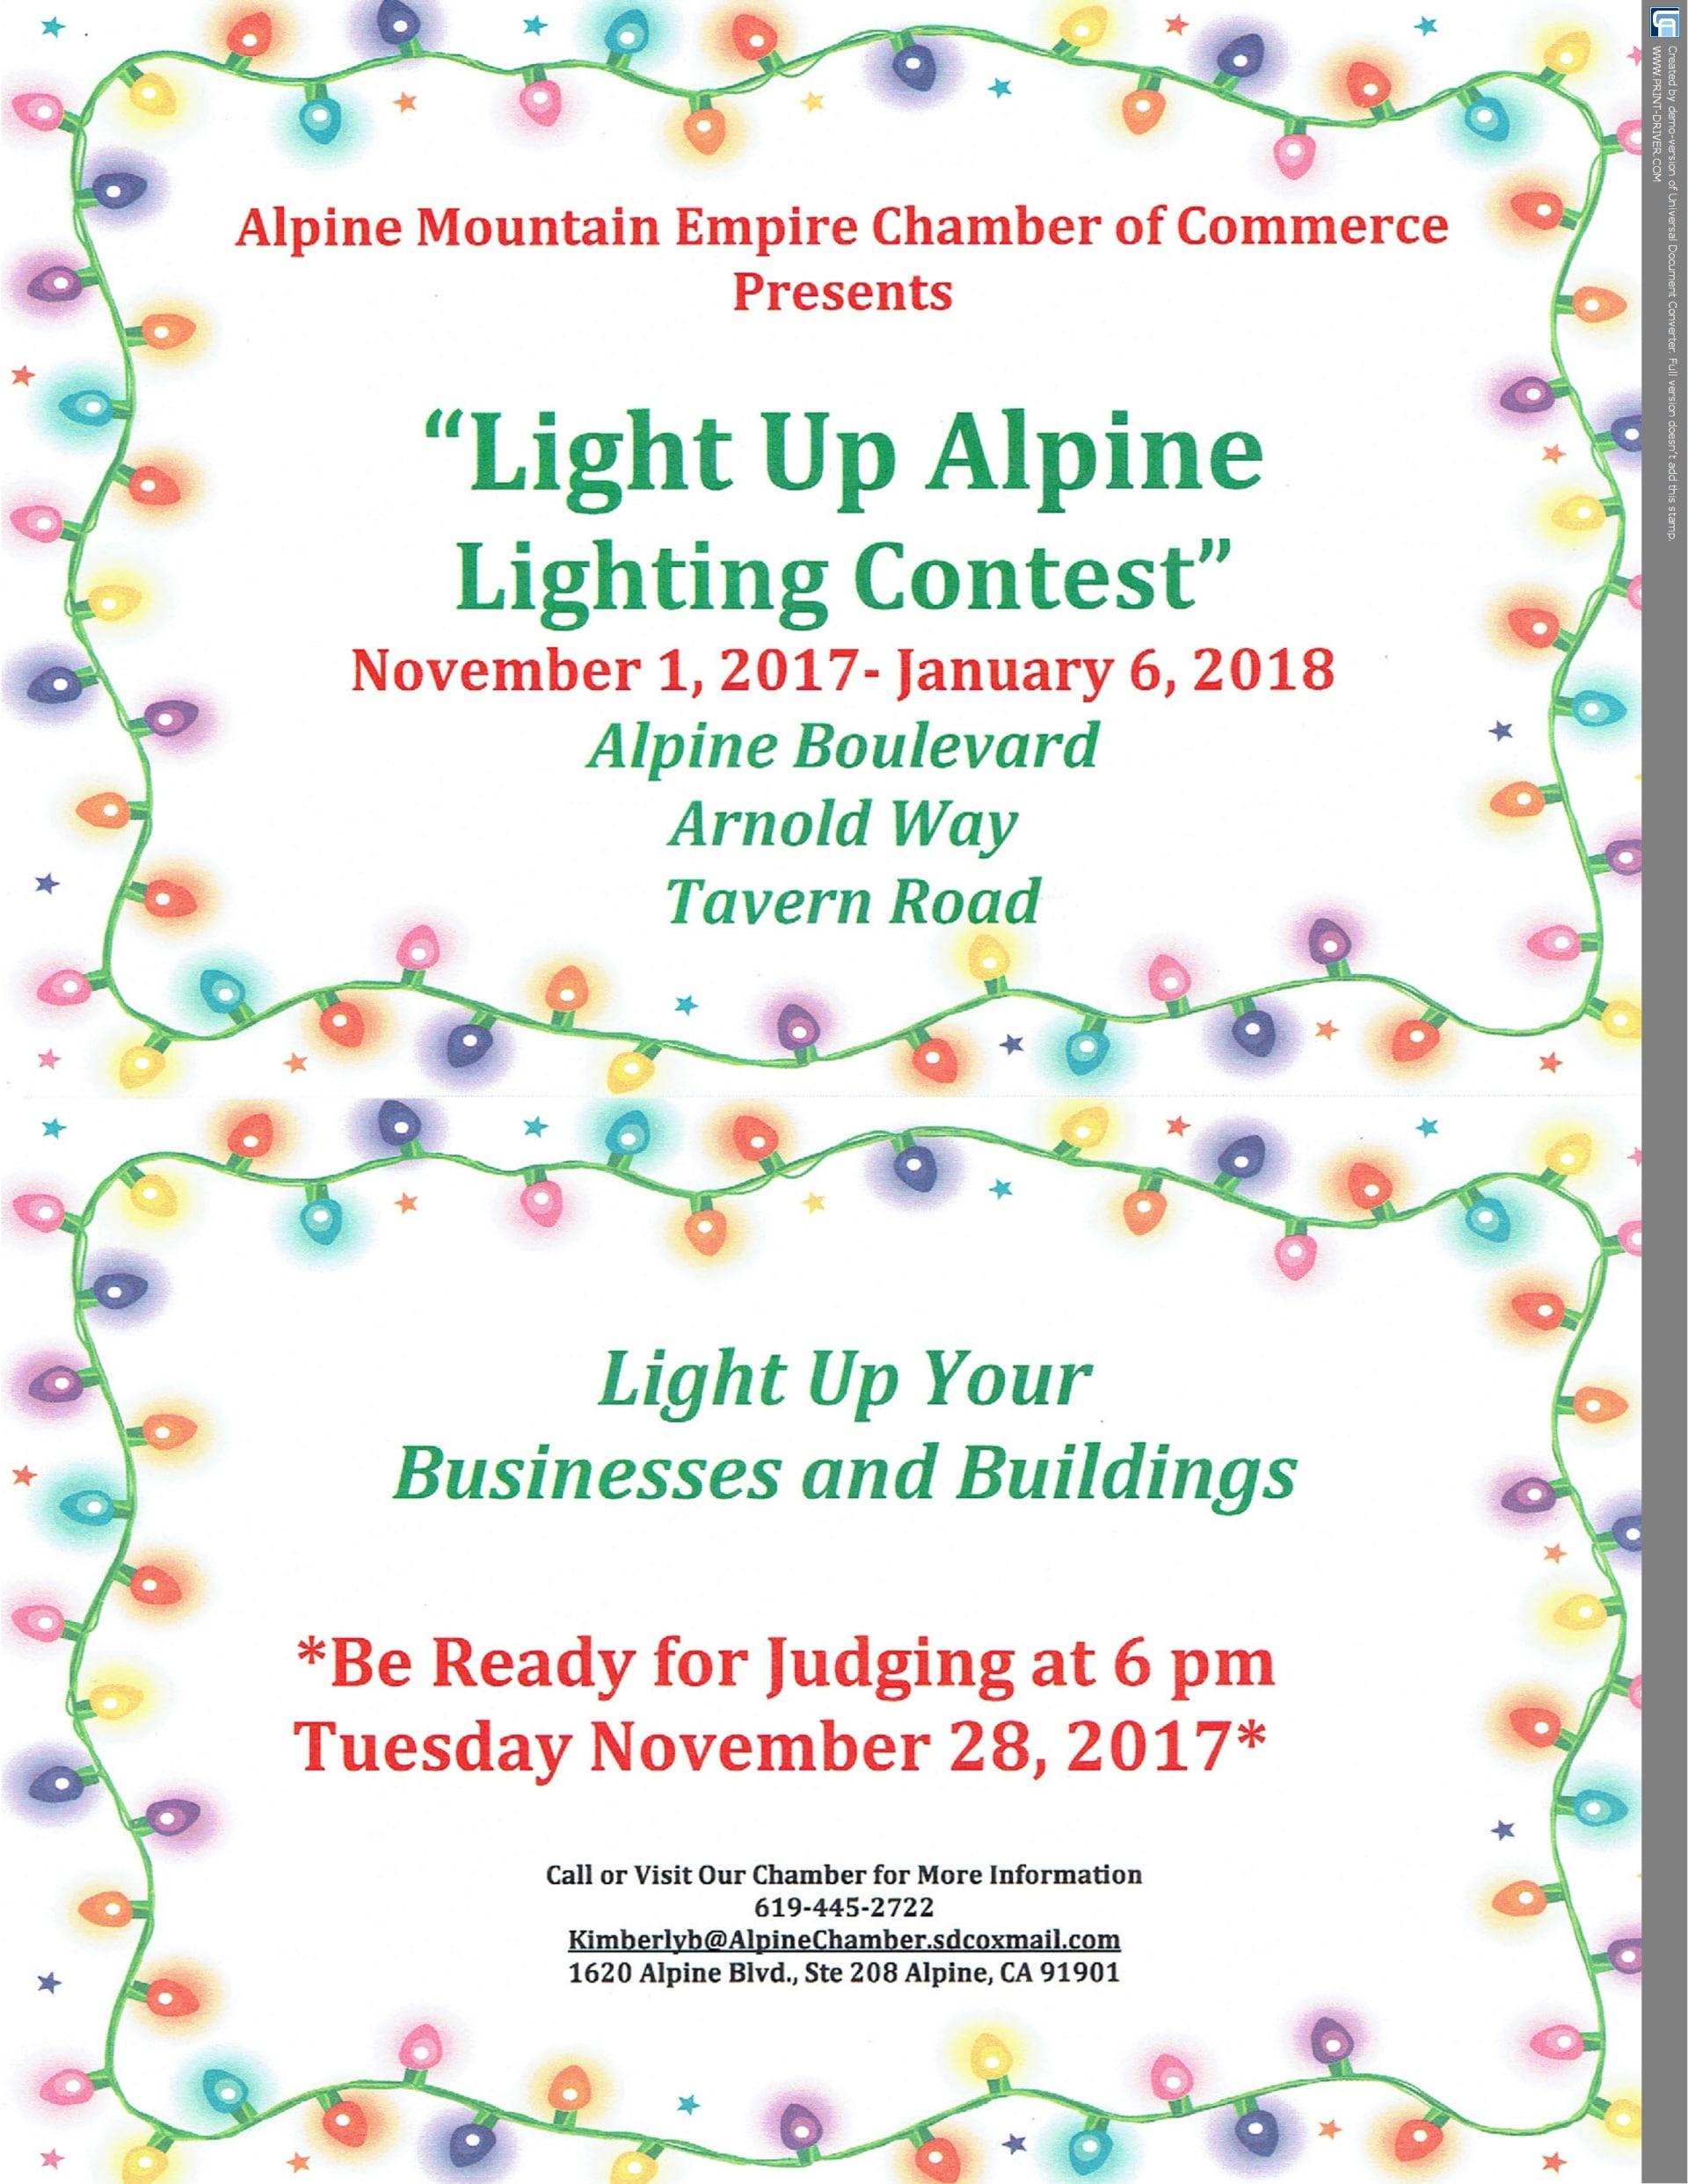 Light-Up-Alpine-Contest-2017-w1920.jpg